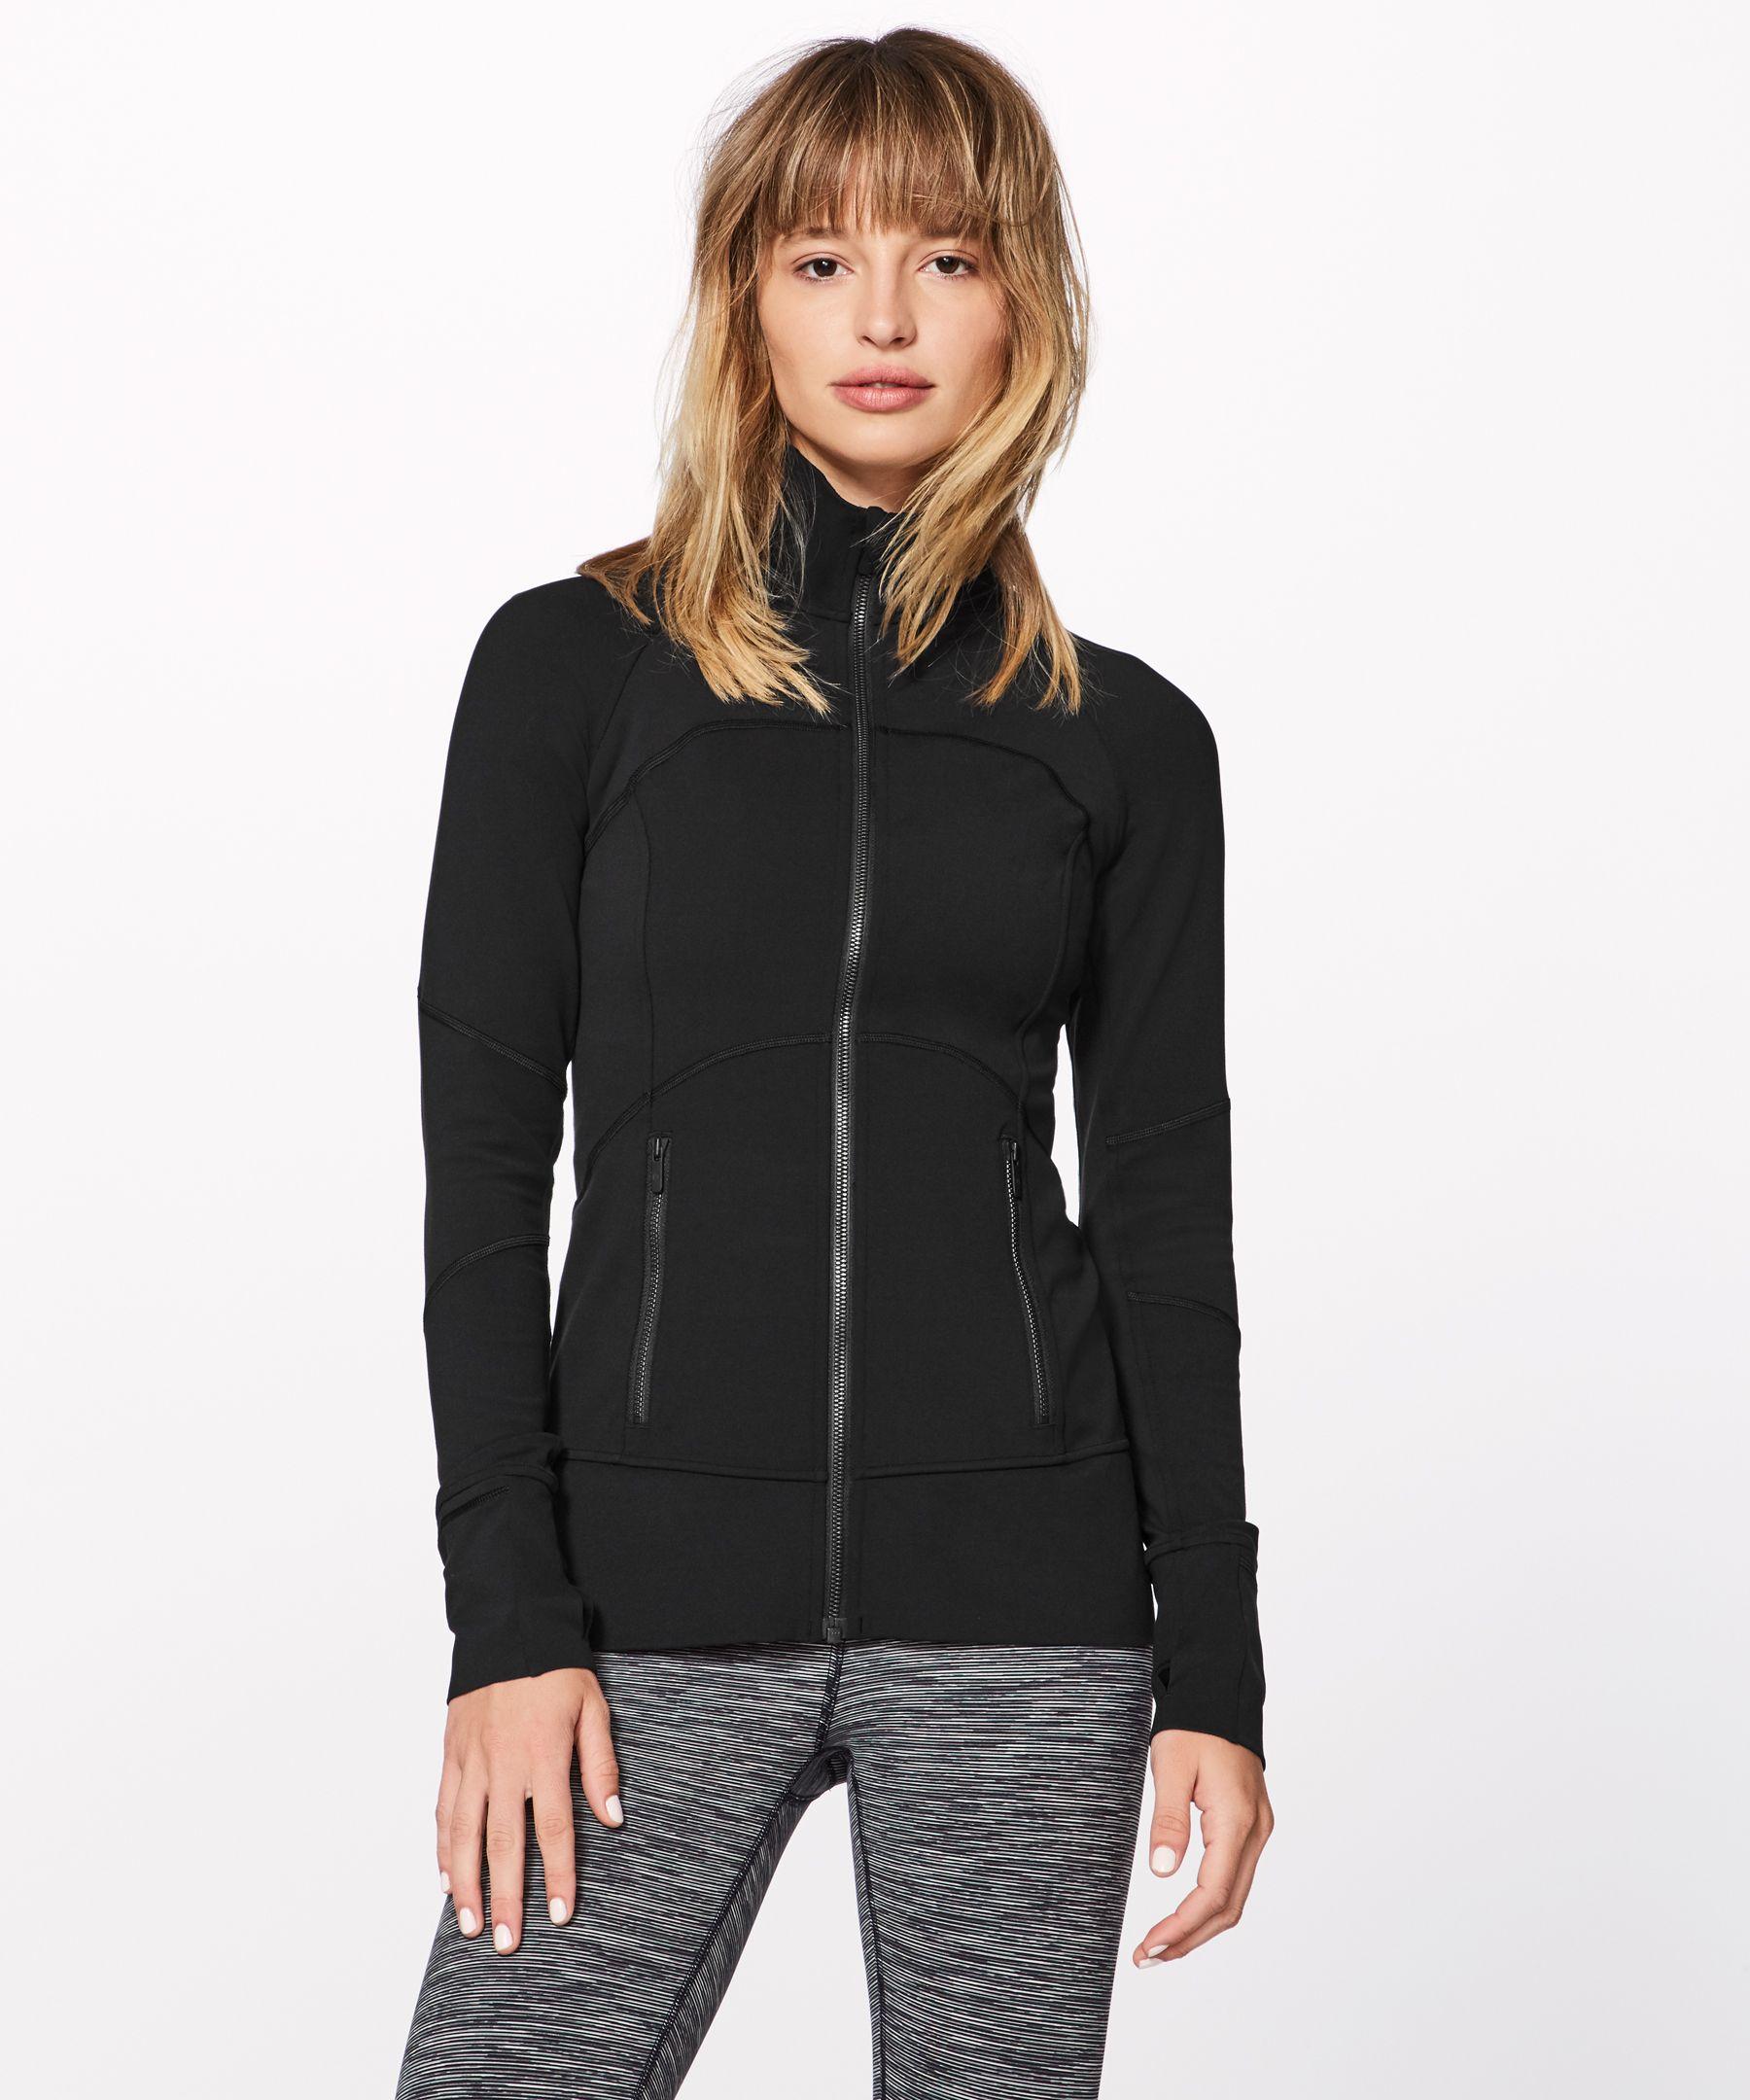 Lululemon jackets women